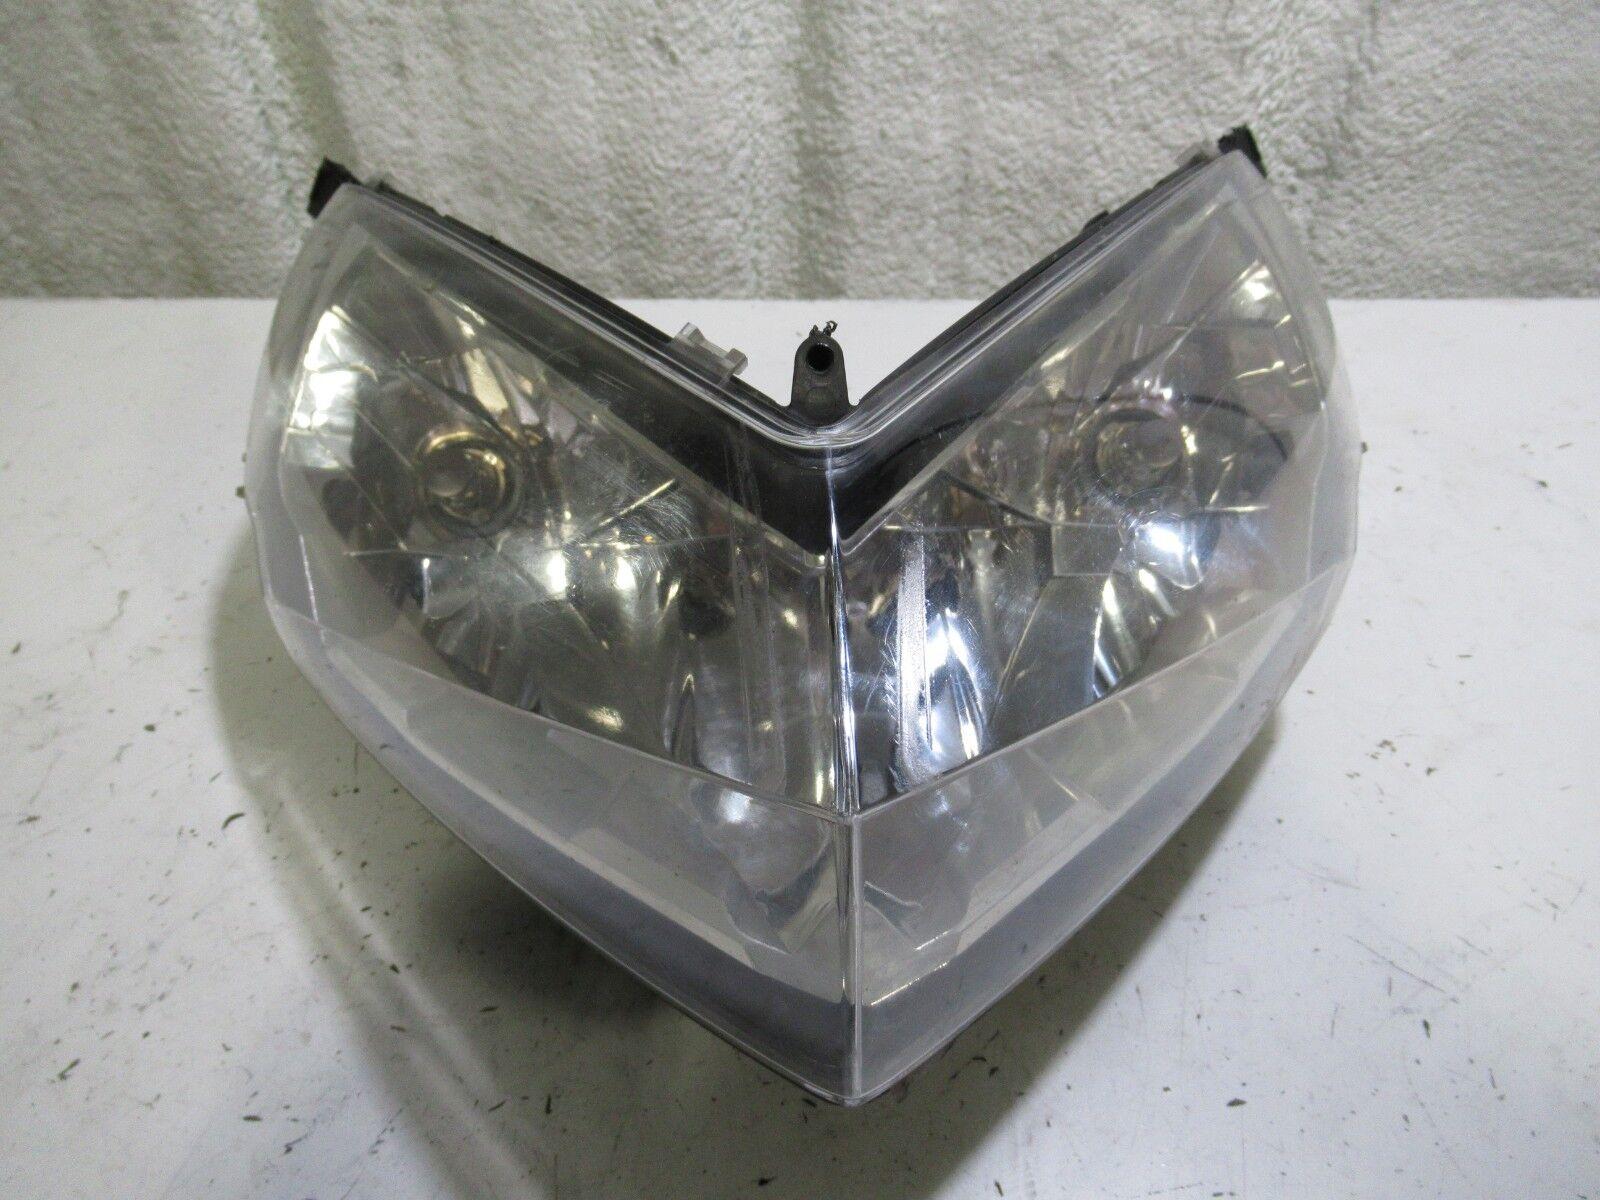 Polaris Pro RMK 800 Headlight 2012 #5